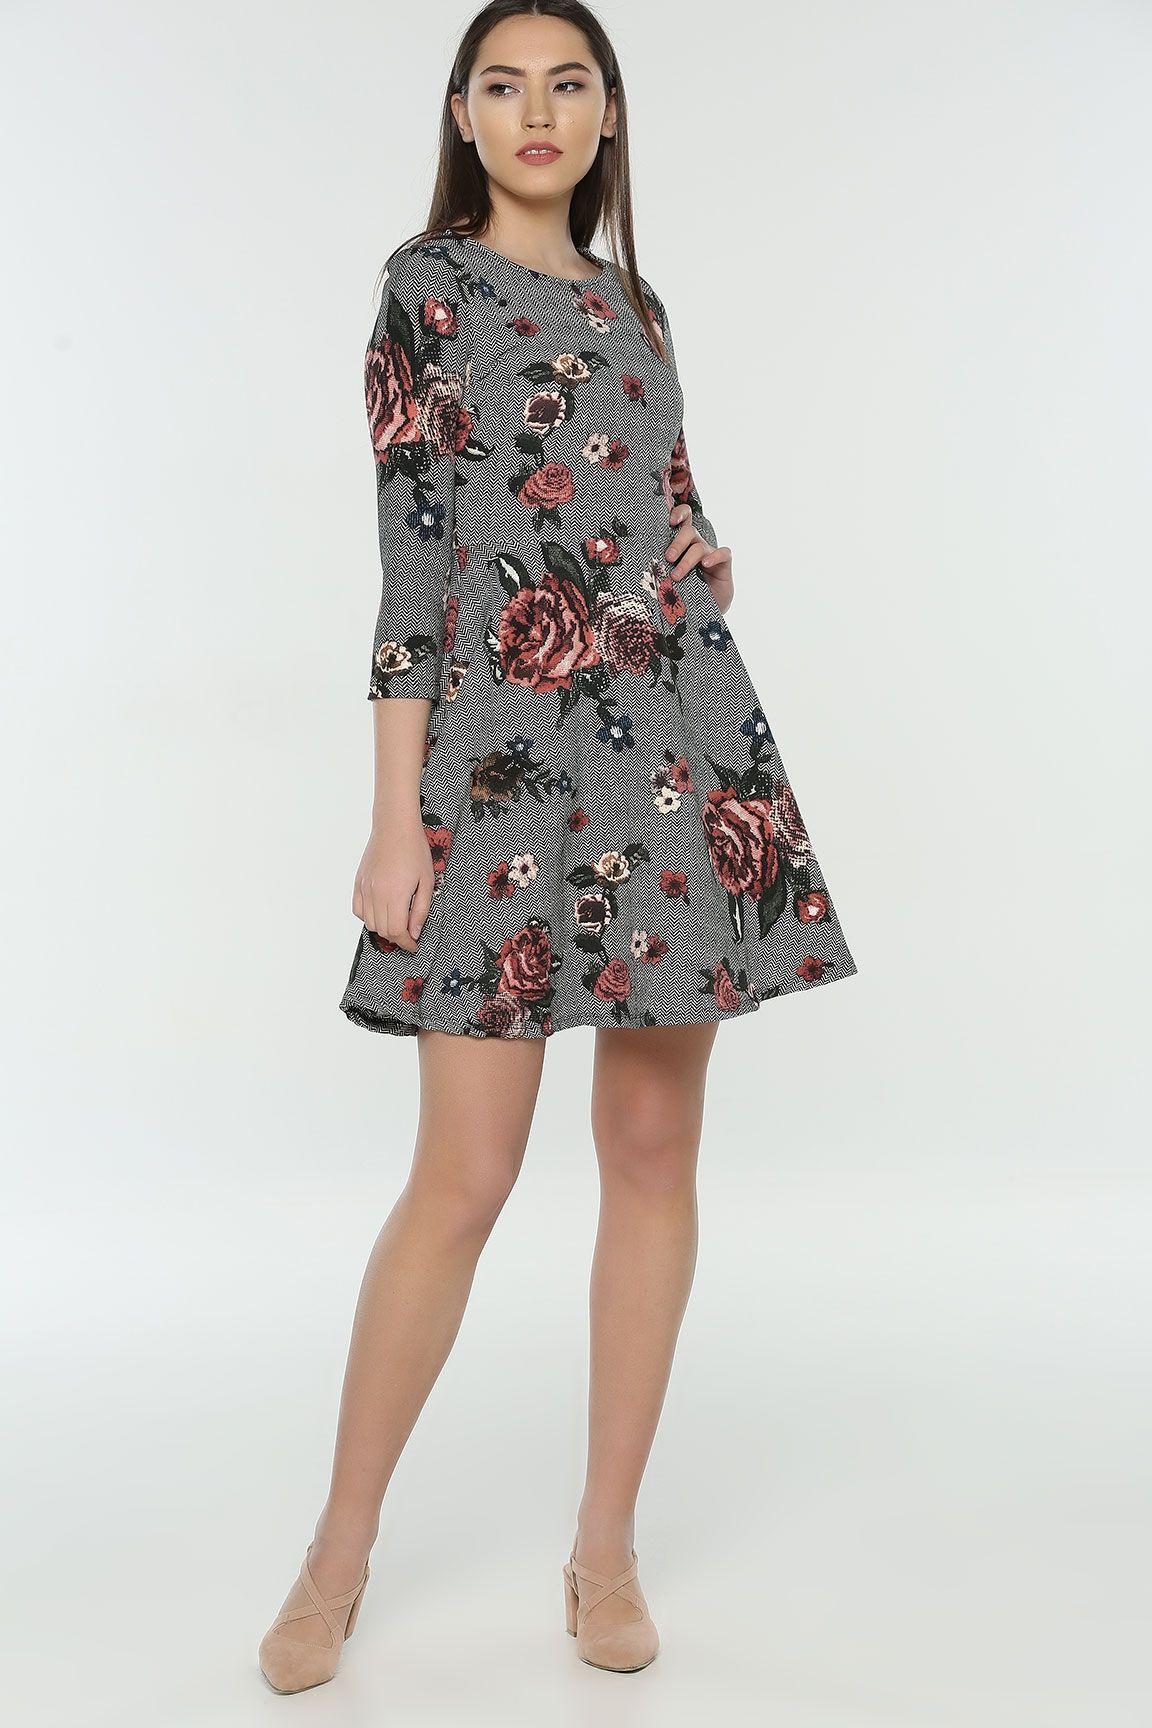 Siyahgul Empirme Elbise Elbise Elbise Modelleri Elbiseler